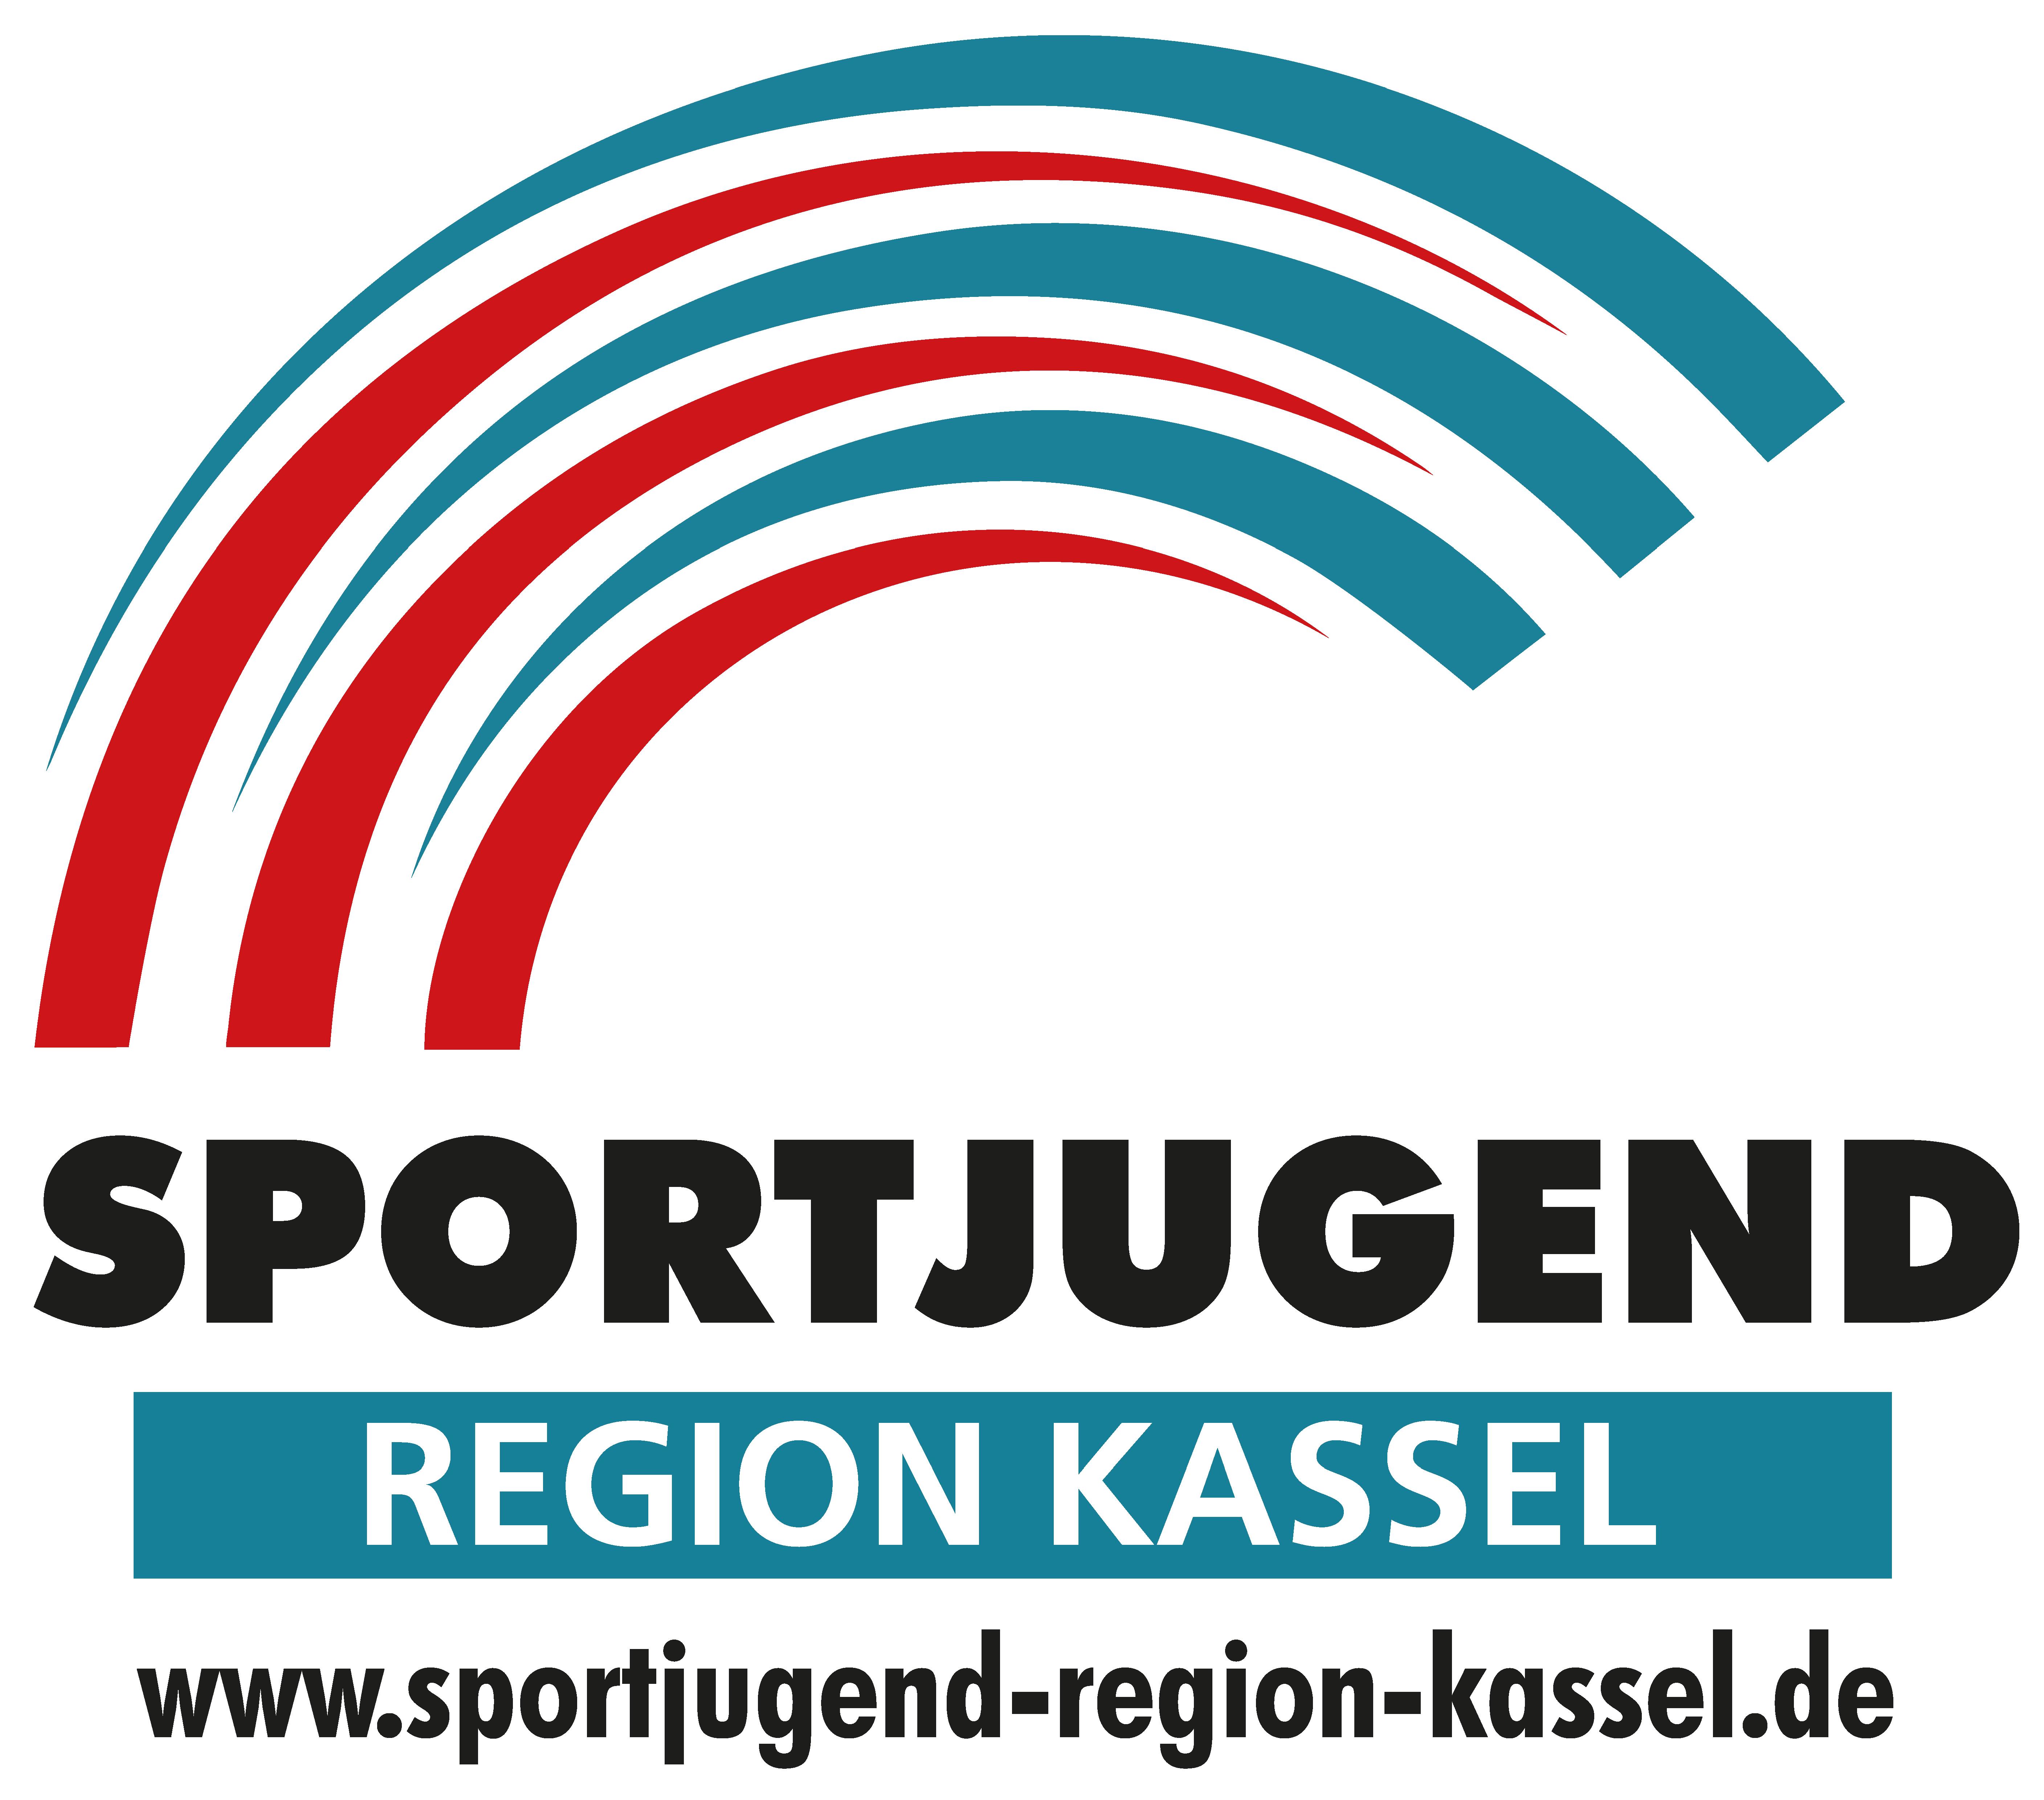 Sportjugend Kassel